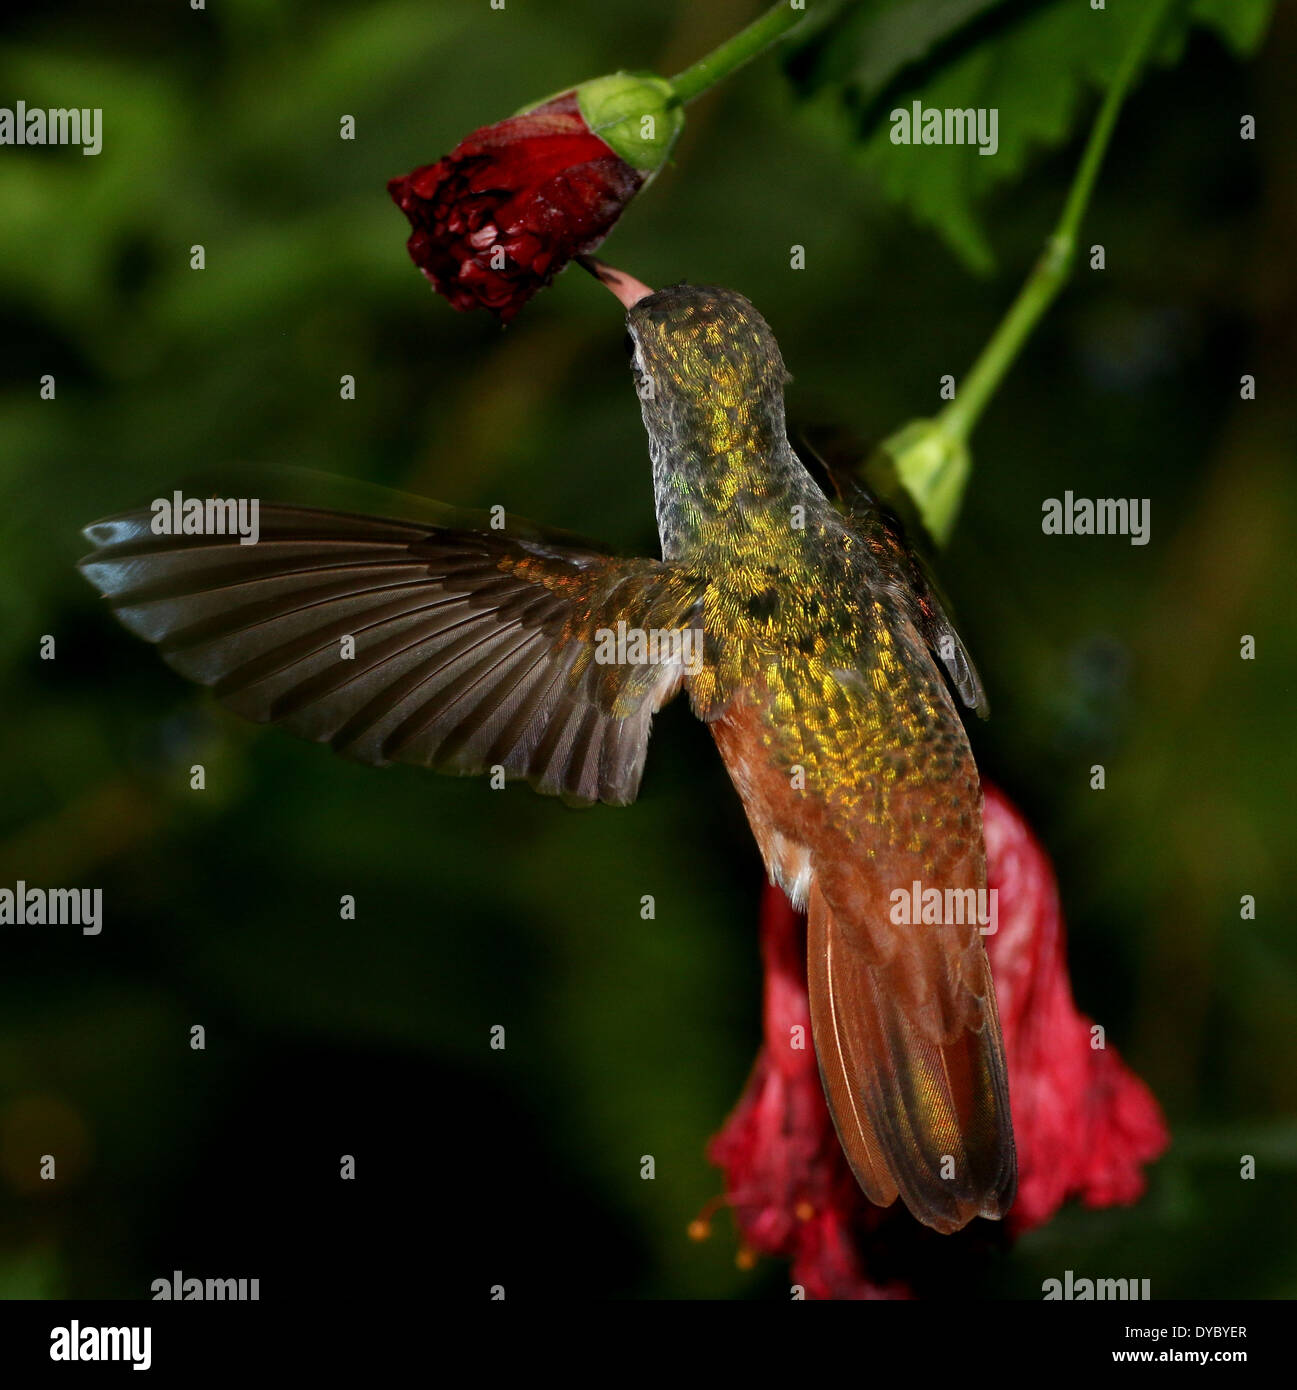 South American Amazilia or Emerald hummingbird ( Amazilia amazilia) in flight, feeding on nectar from a tropical flower - Stock Image